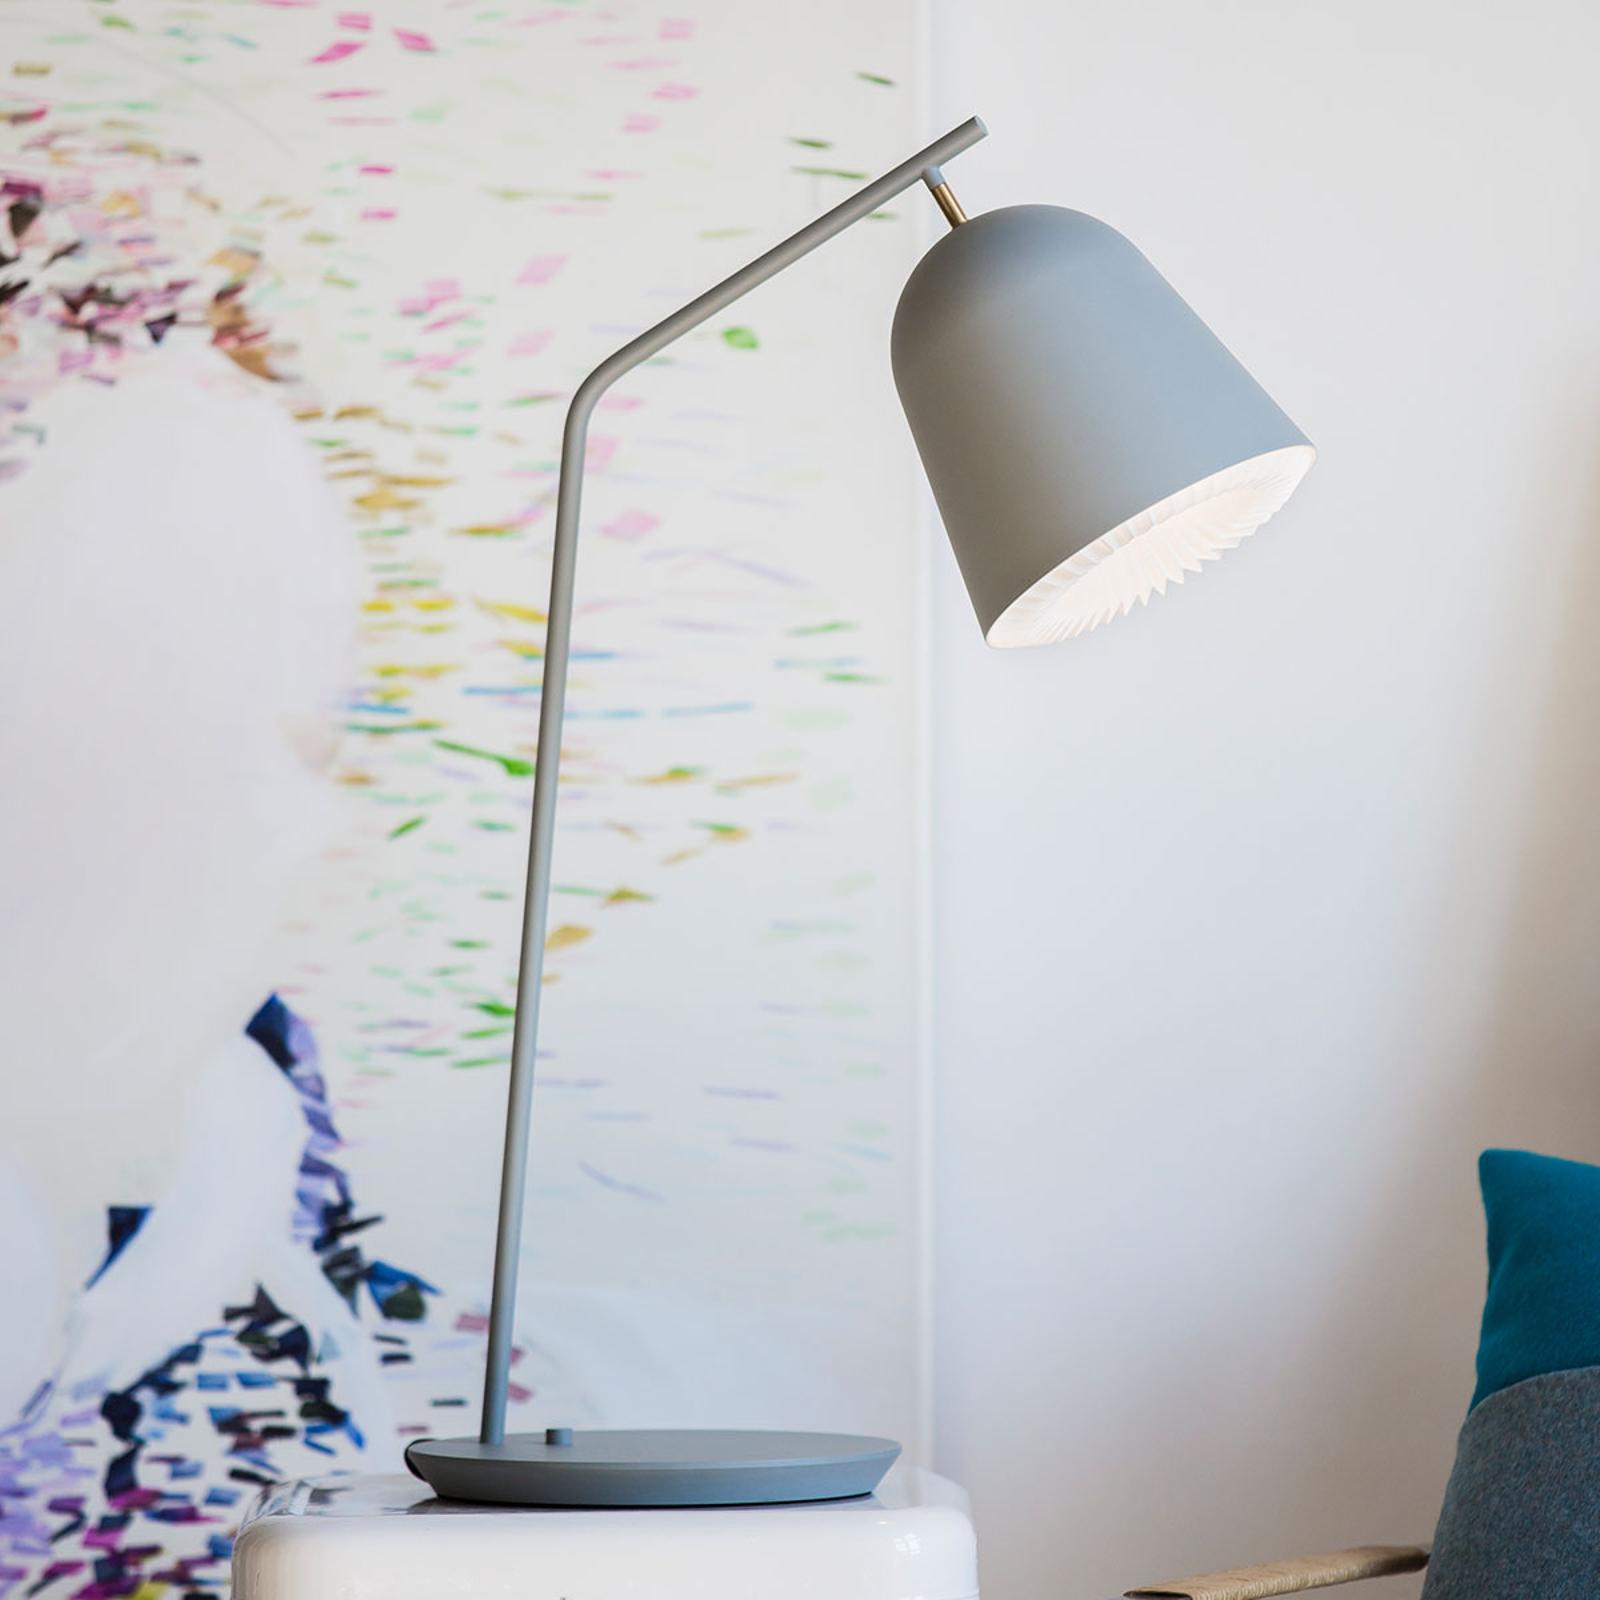 Le KLINT Caché - designer tafellamp in grijs